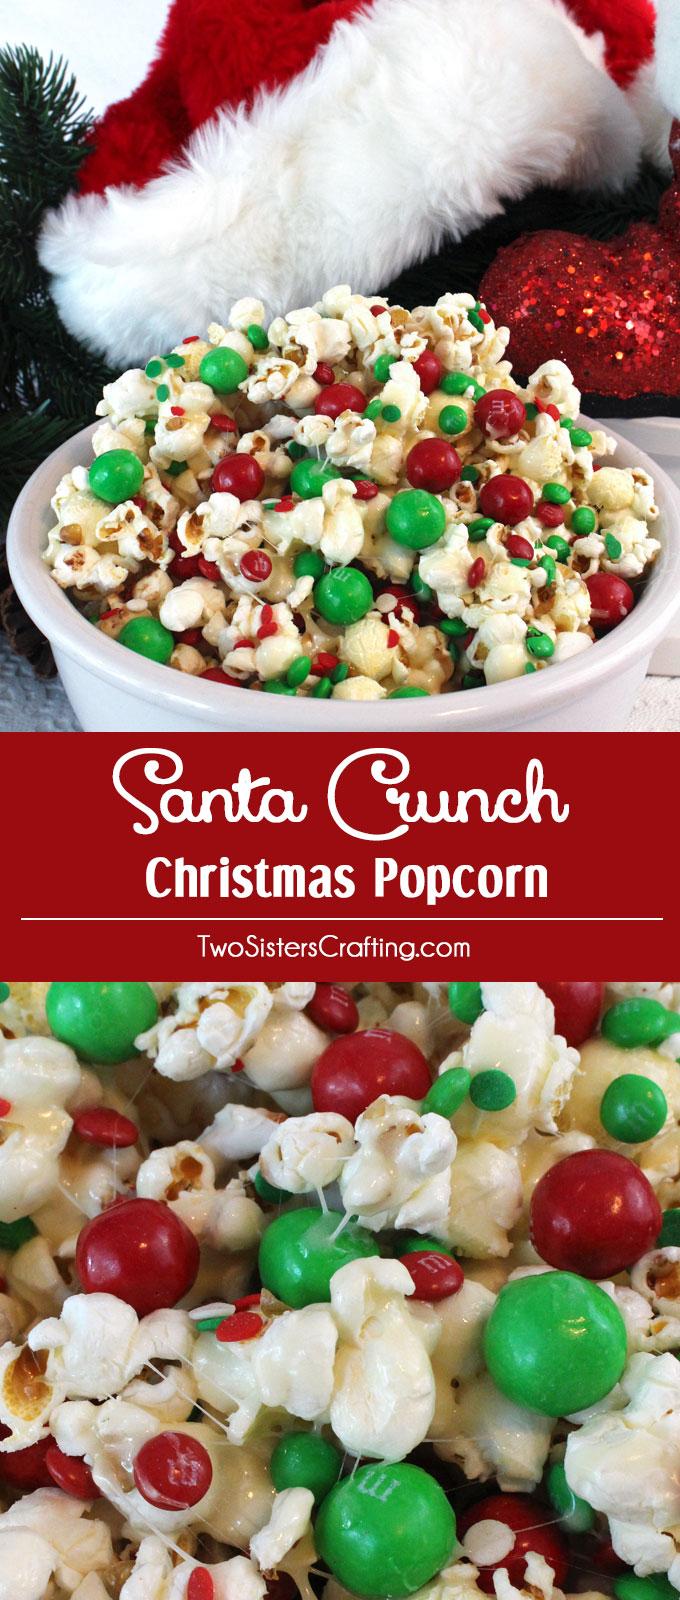 santa-crunch-christmas-popcorn-branded